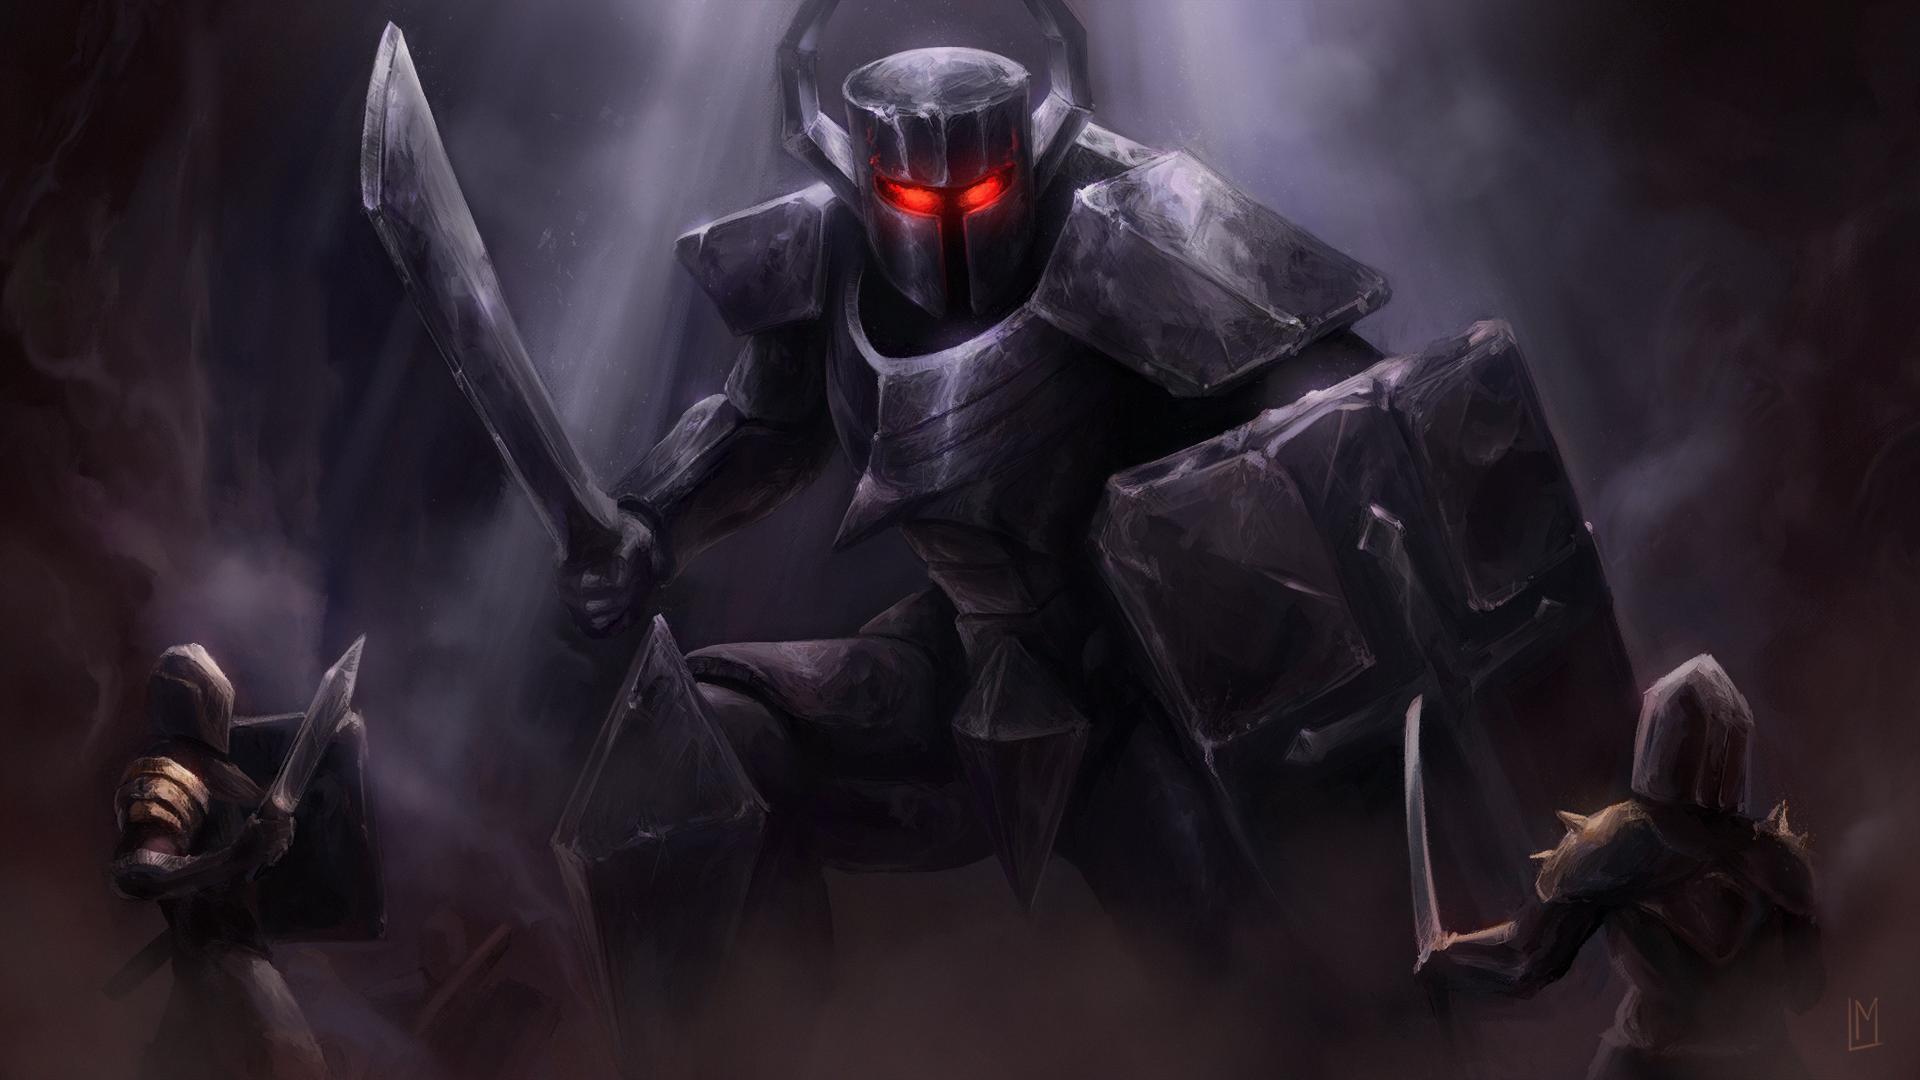 Oryx The Mad God Hd Wallpaper Background Image 1920x1080 Id